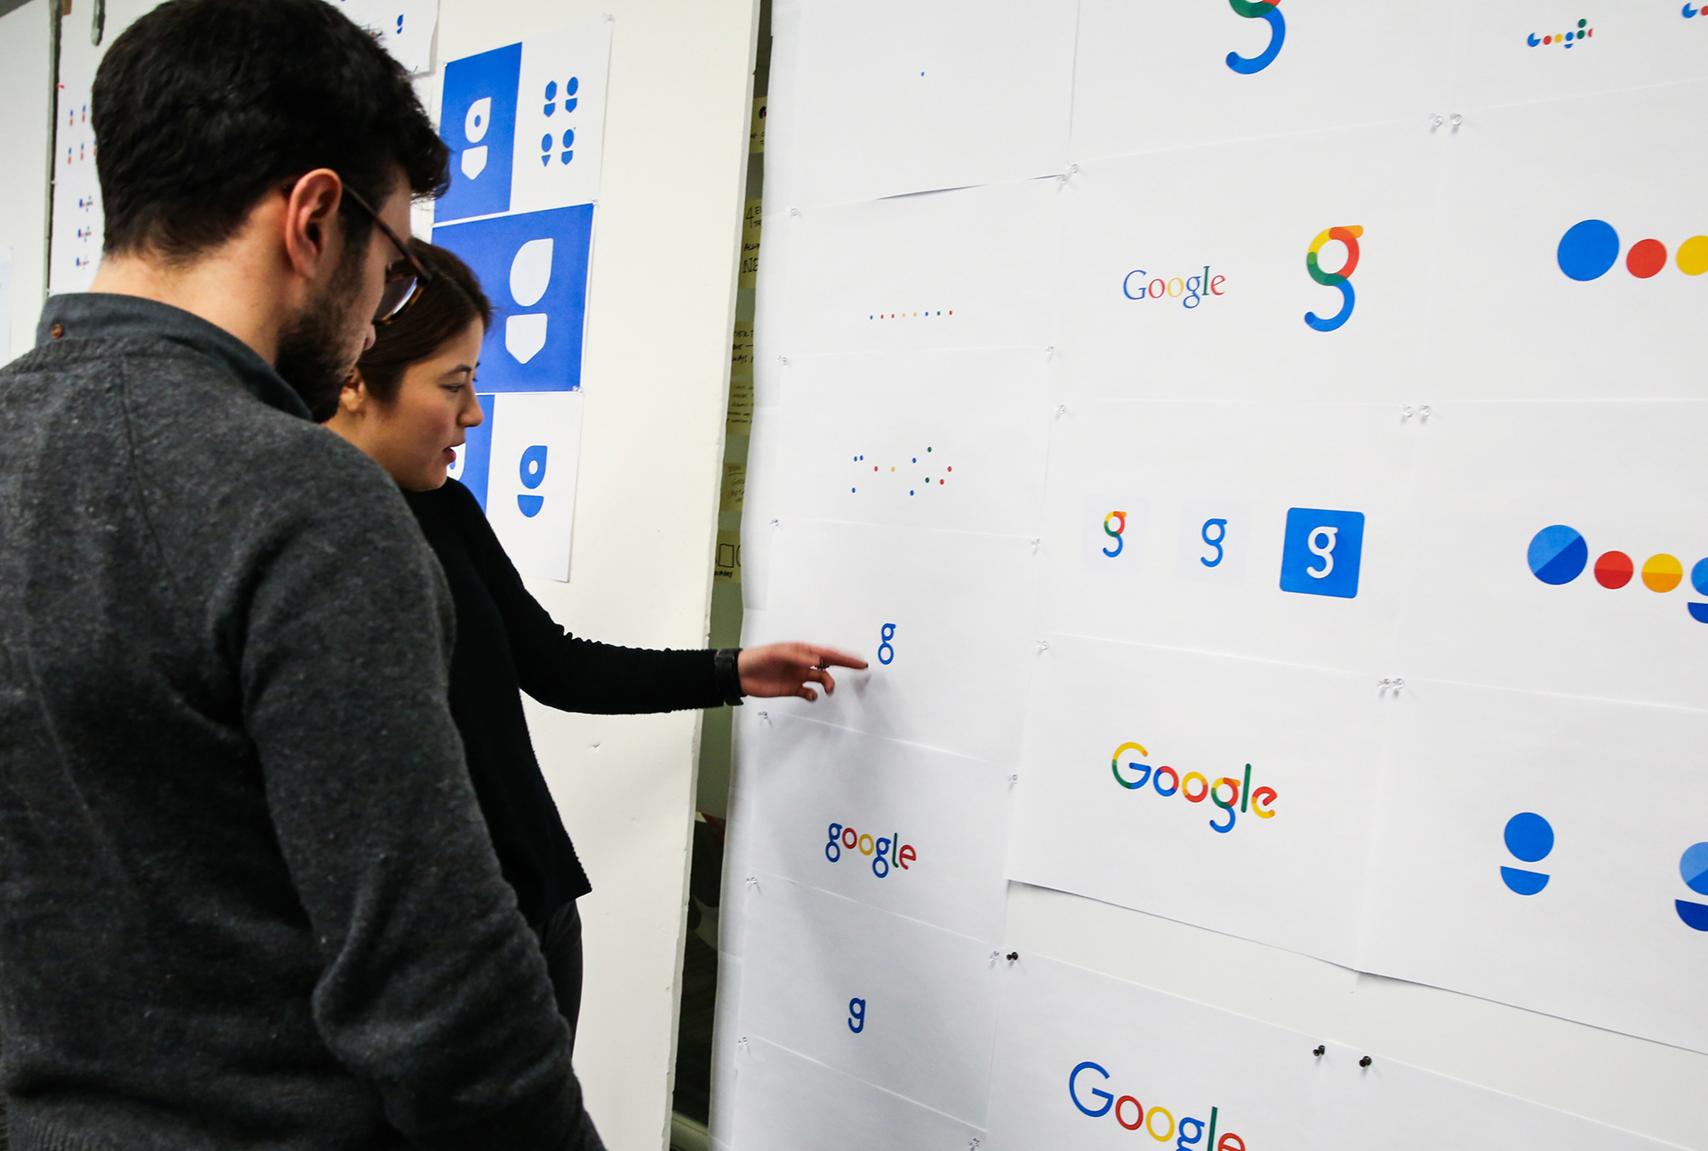 Evolving the Google Identity.